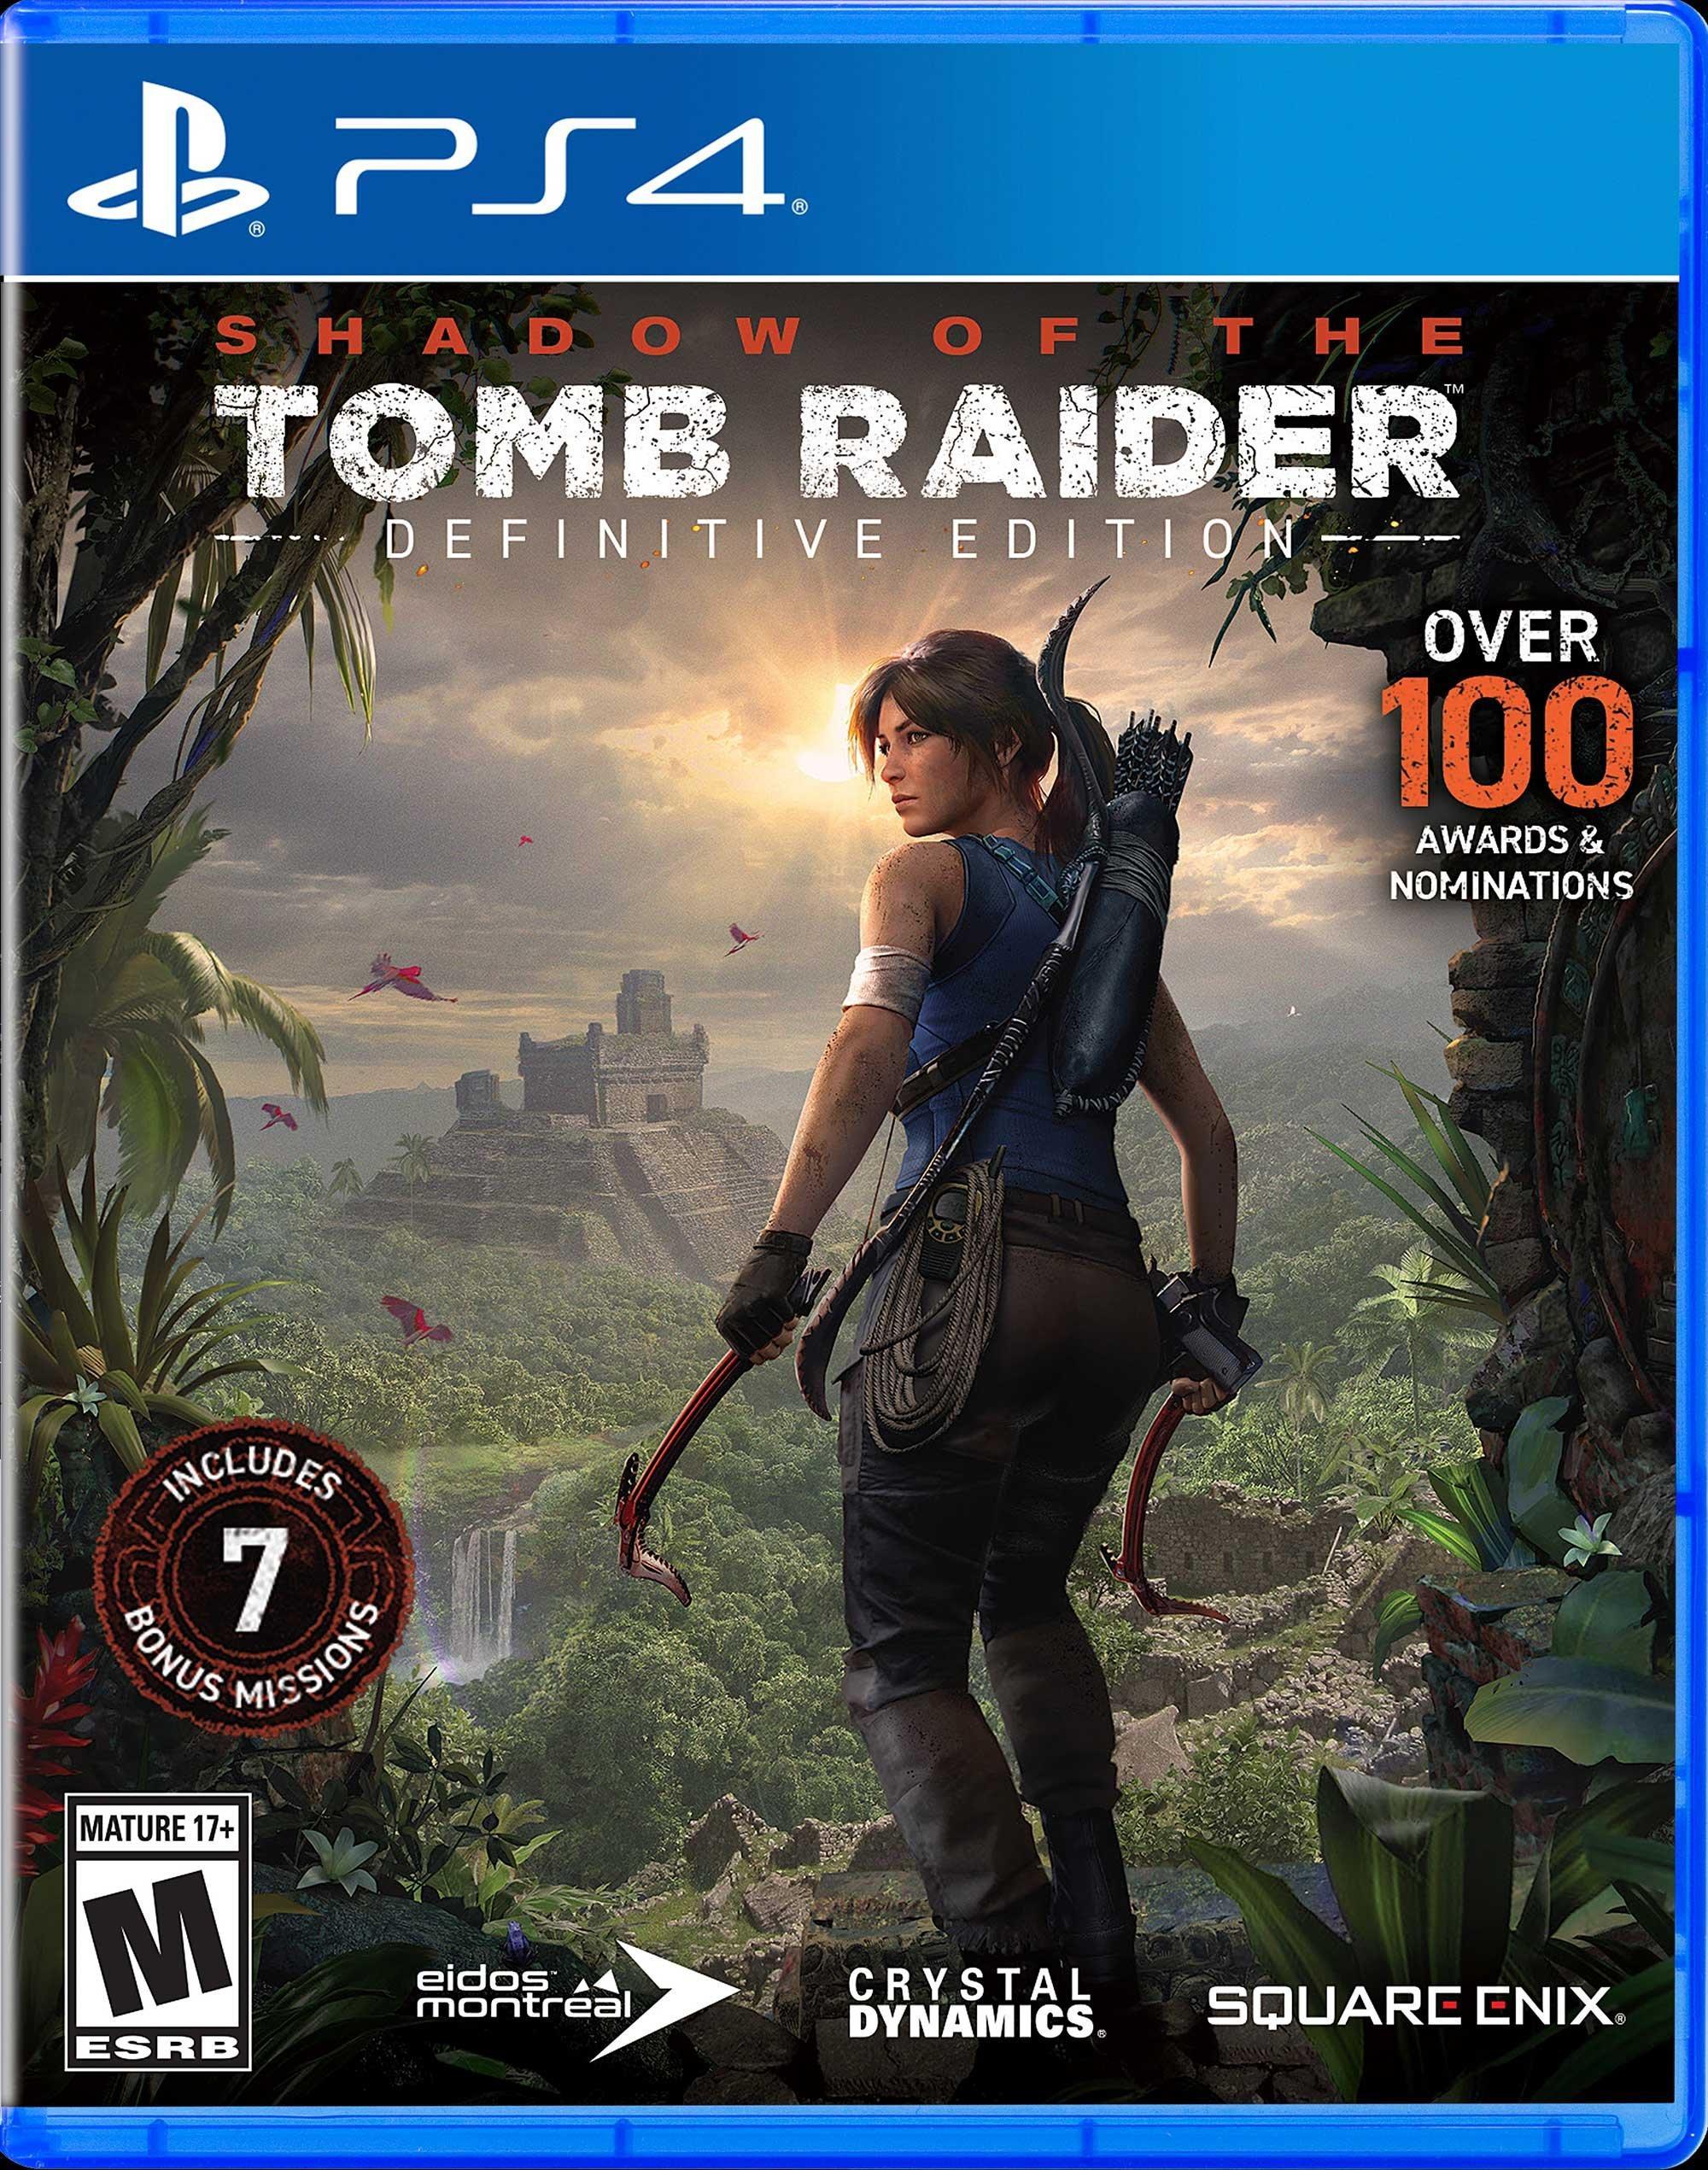 tomb raider video game order